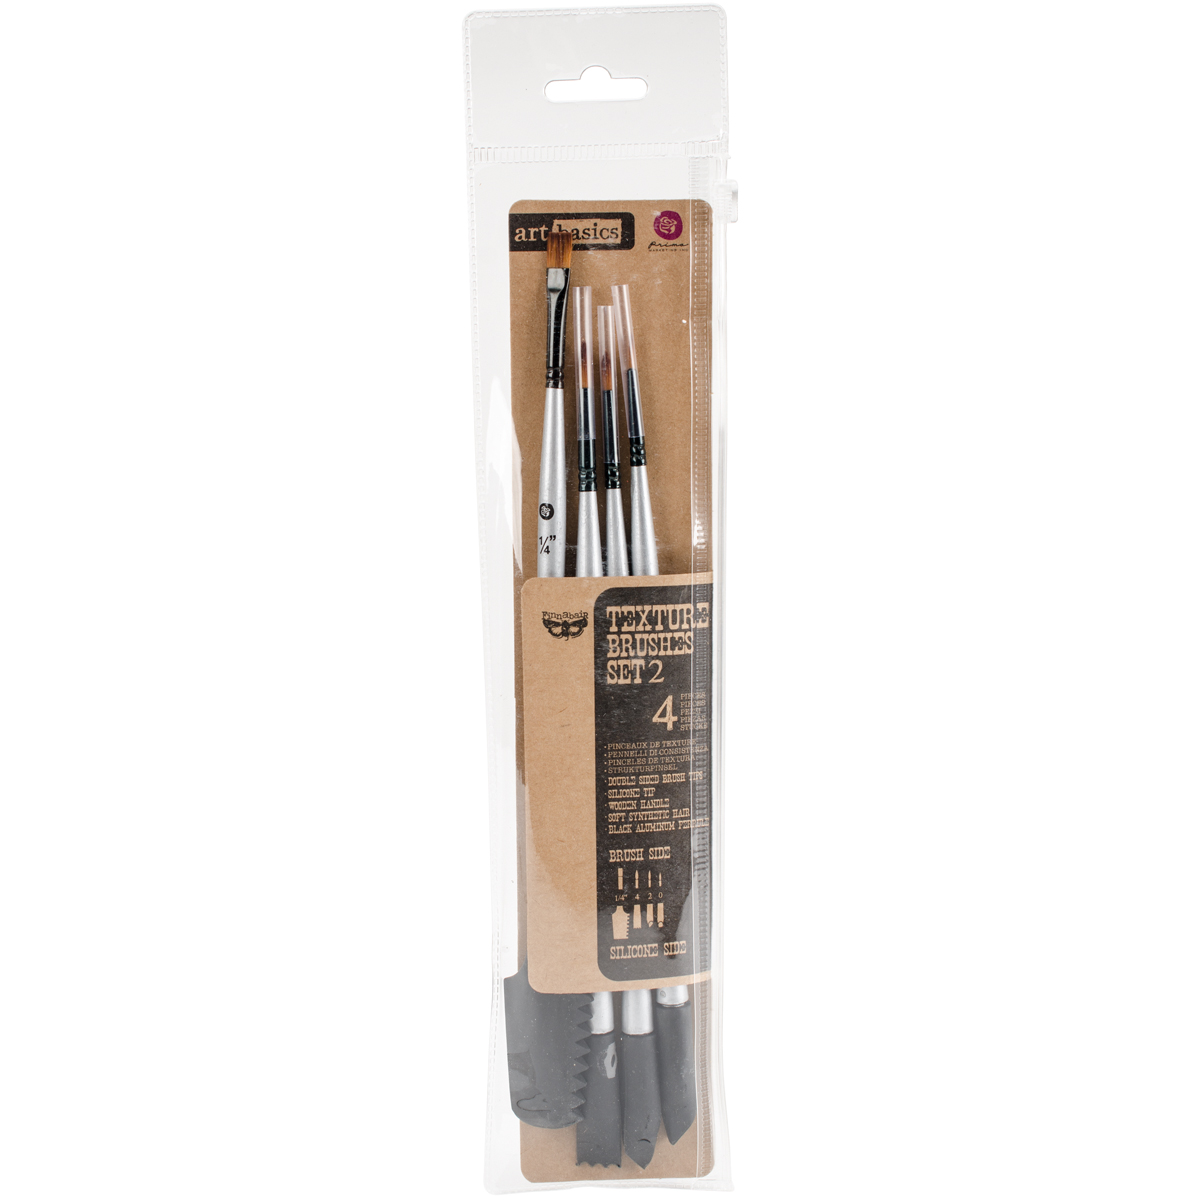 Texture Brushes set2-4